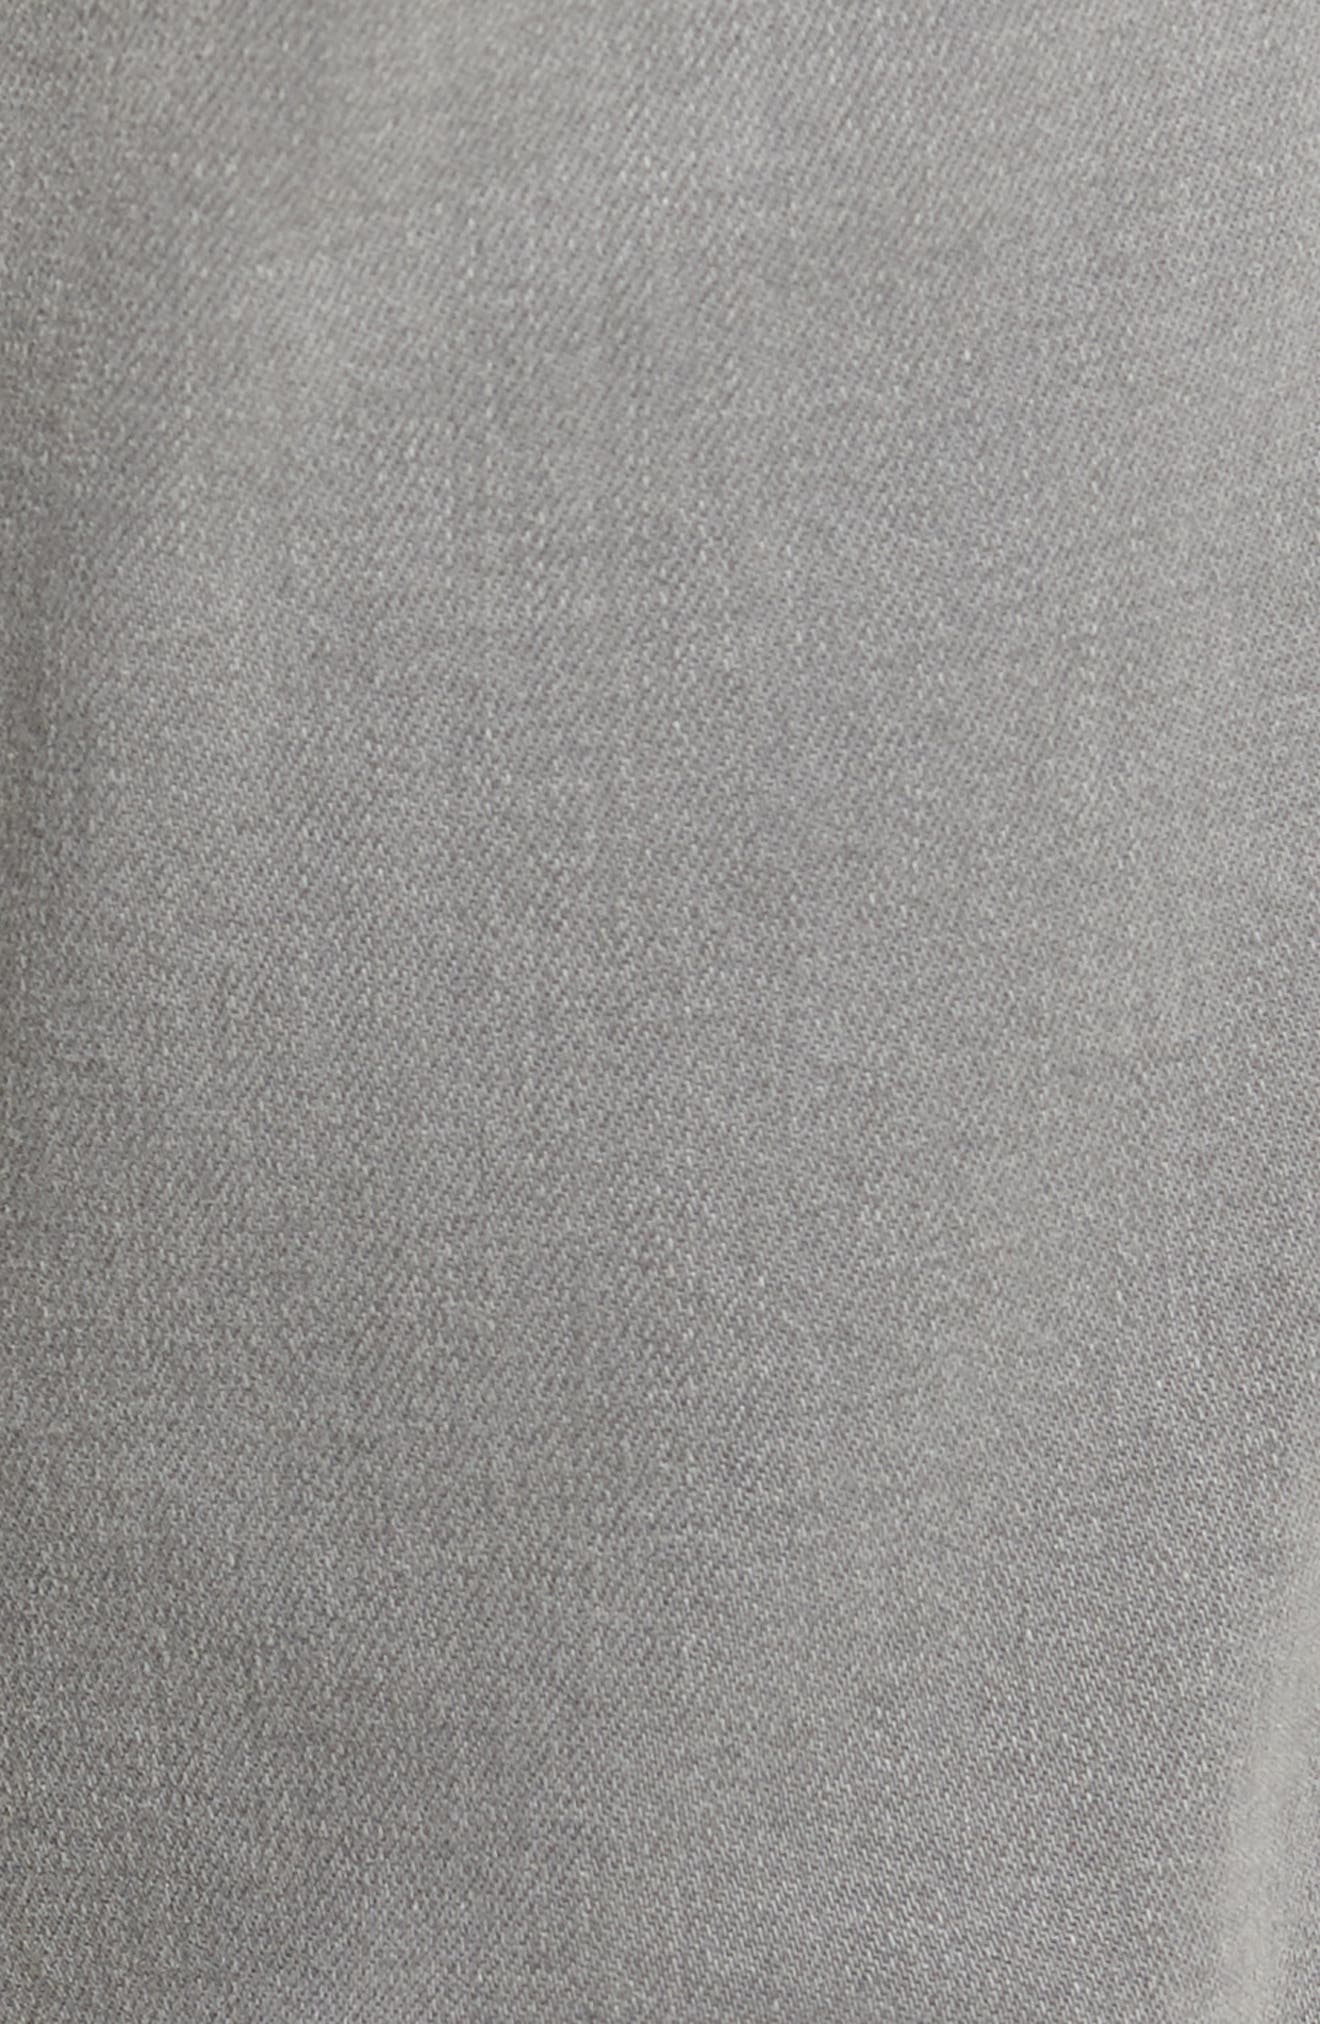 L'Homme Skinny Fit Jeans,                             Alternate thumbnail 5, color,                             030